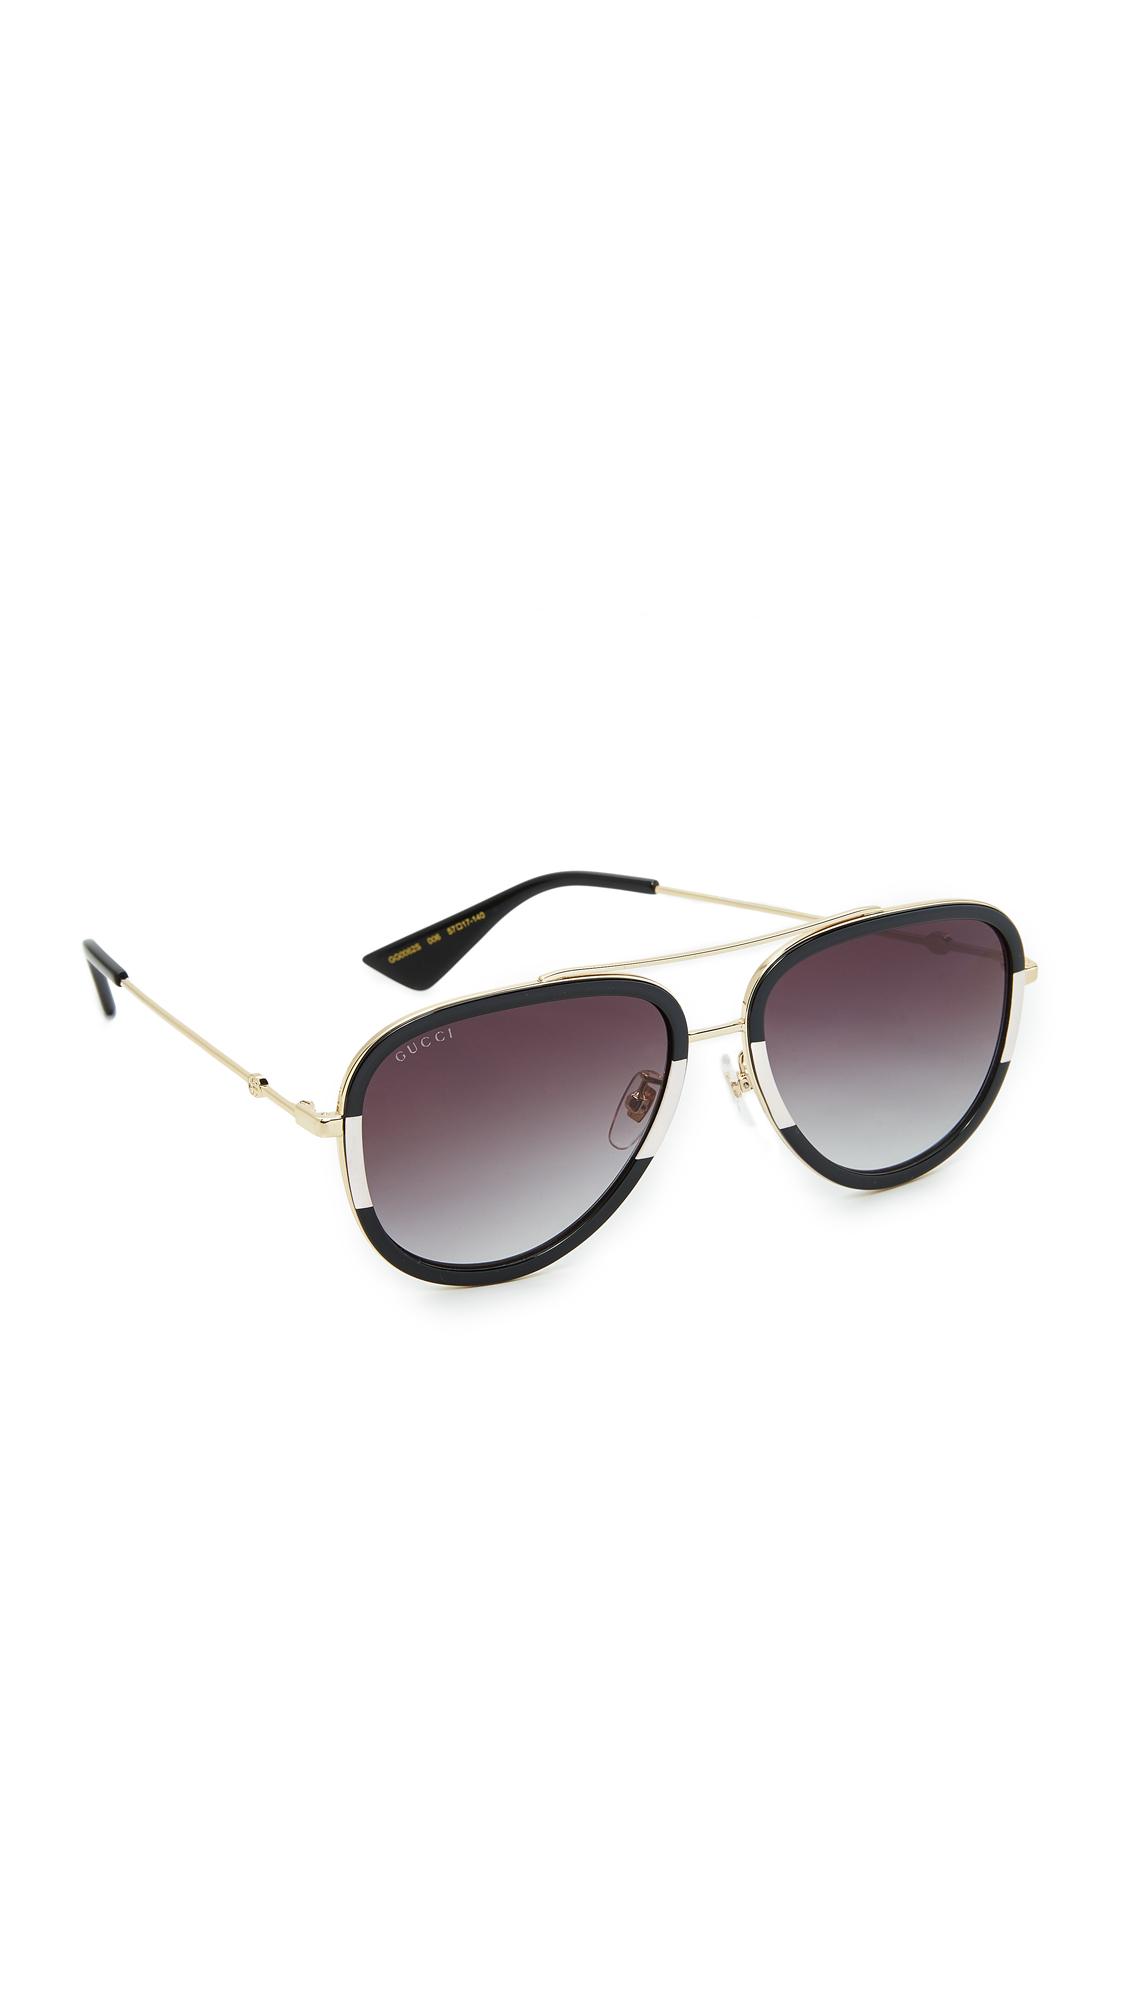 Gucci Pilot Urban Web Block Aviator Sunglasses - Gold/Grey at Shopbop